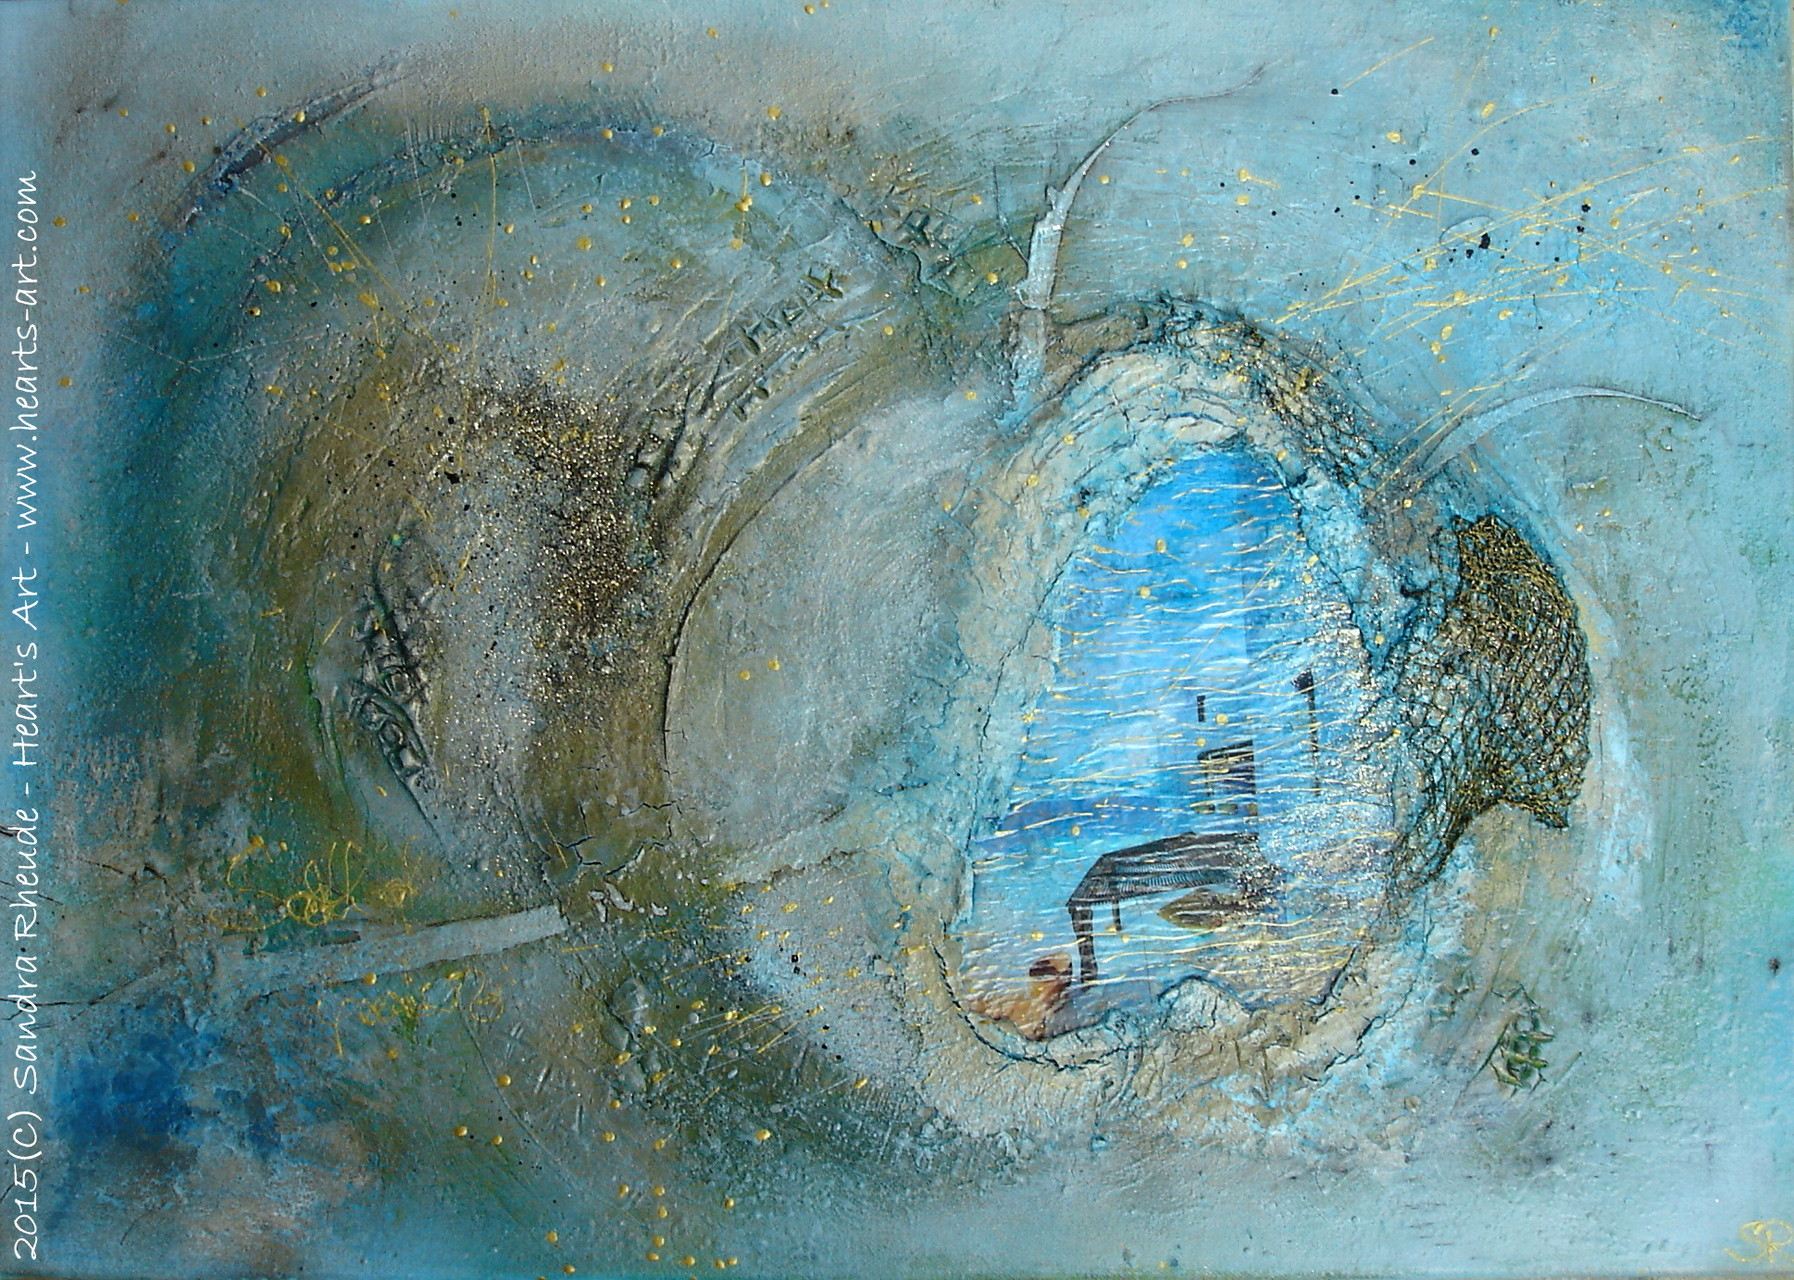 'Dreamscape' - 2015/14 - Acryl/MixedMedia auf Leinwand - 70 x 50 cm - € 290